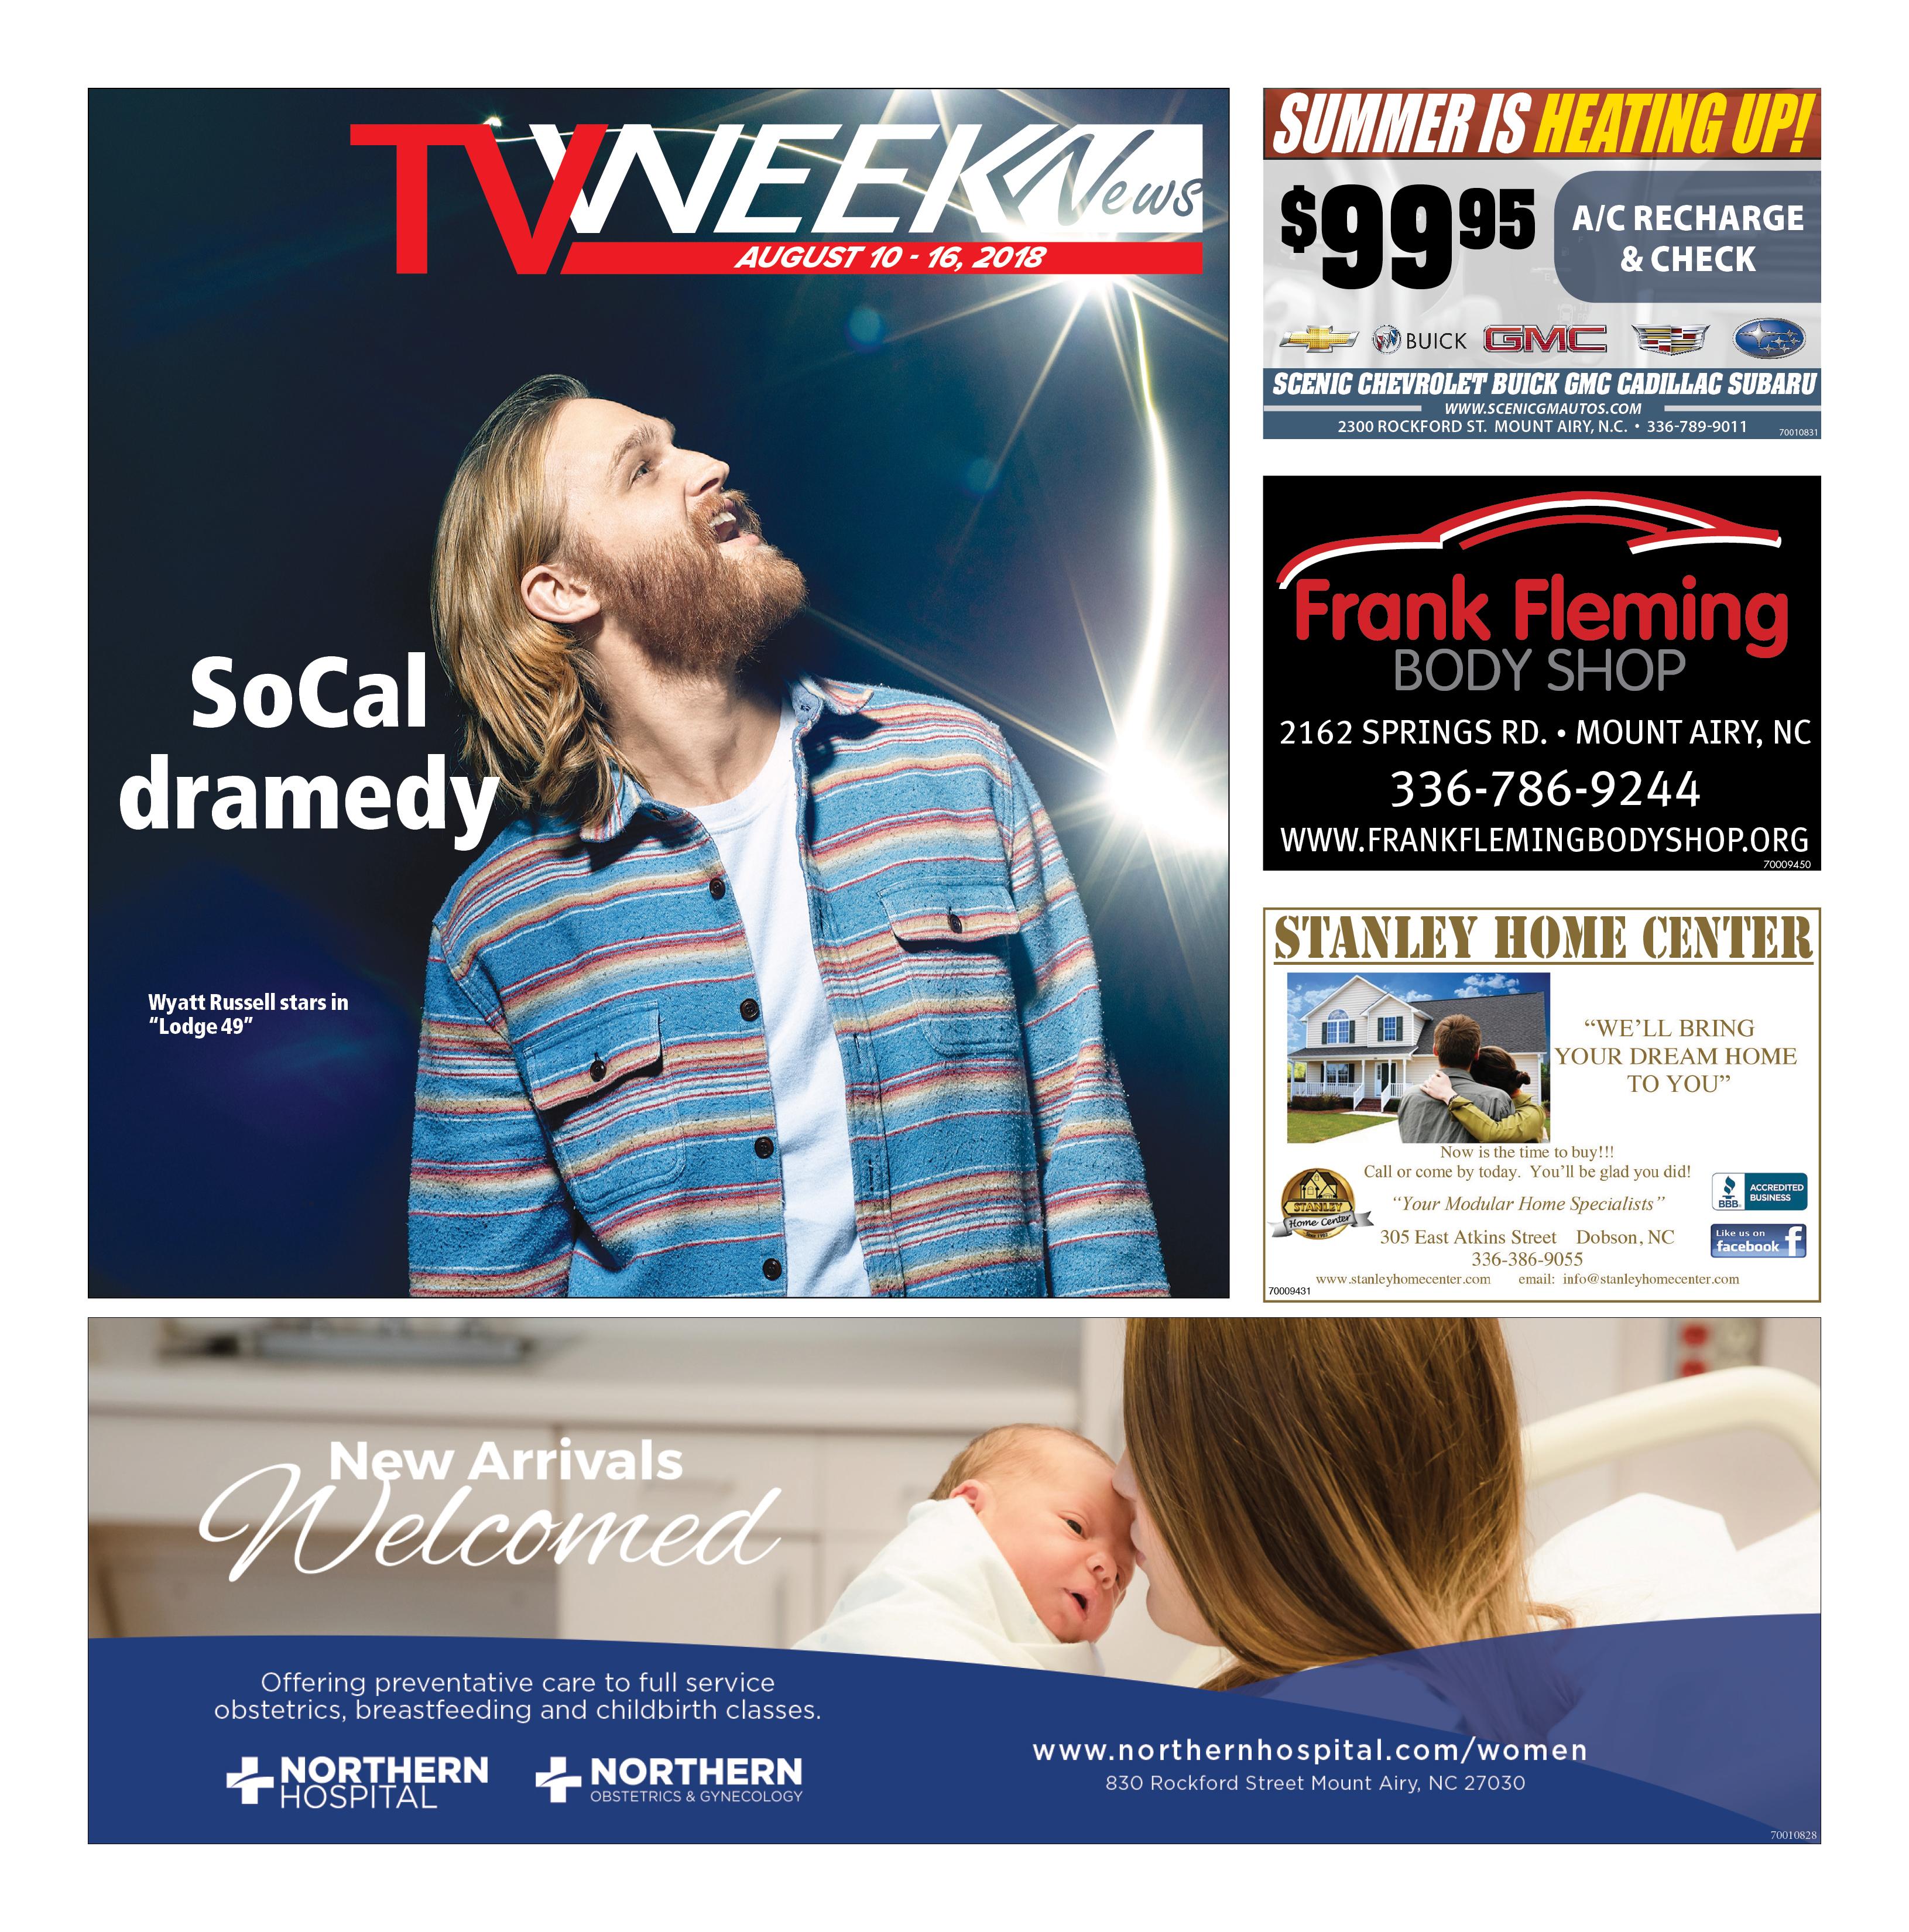 TV WEEK News August 10-16, 2018